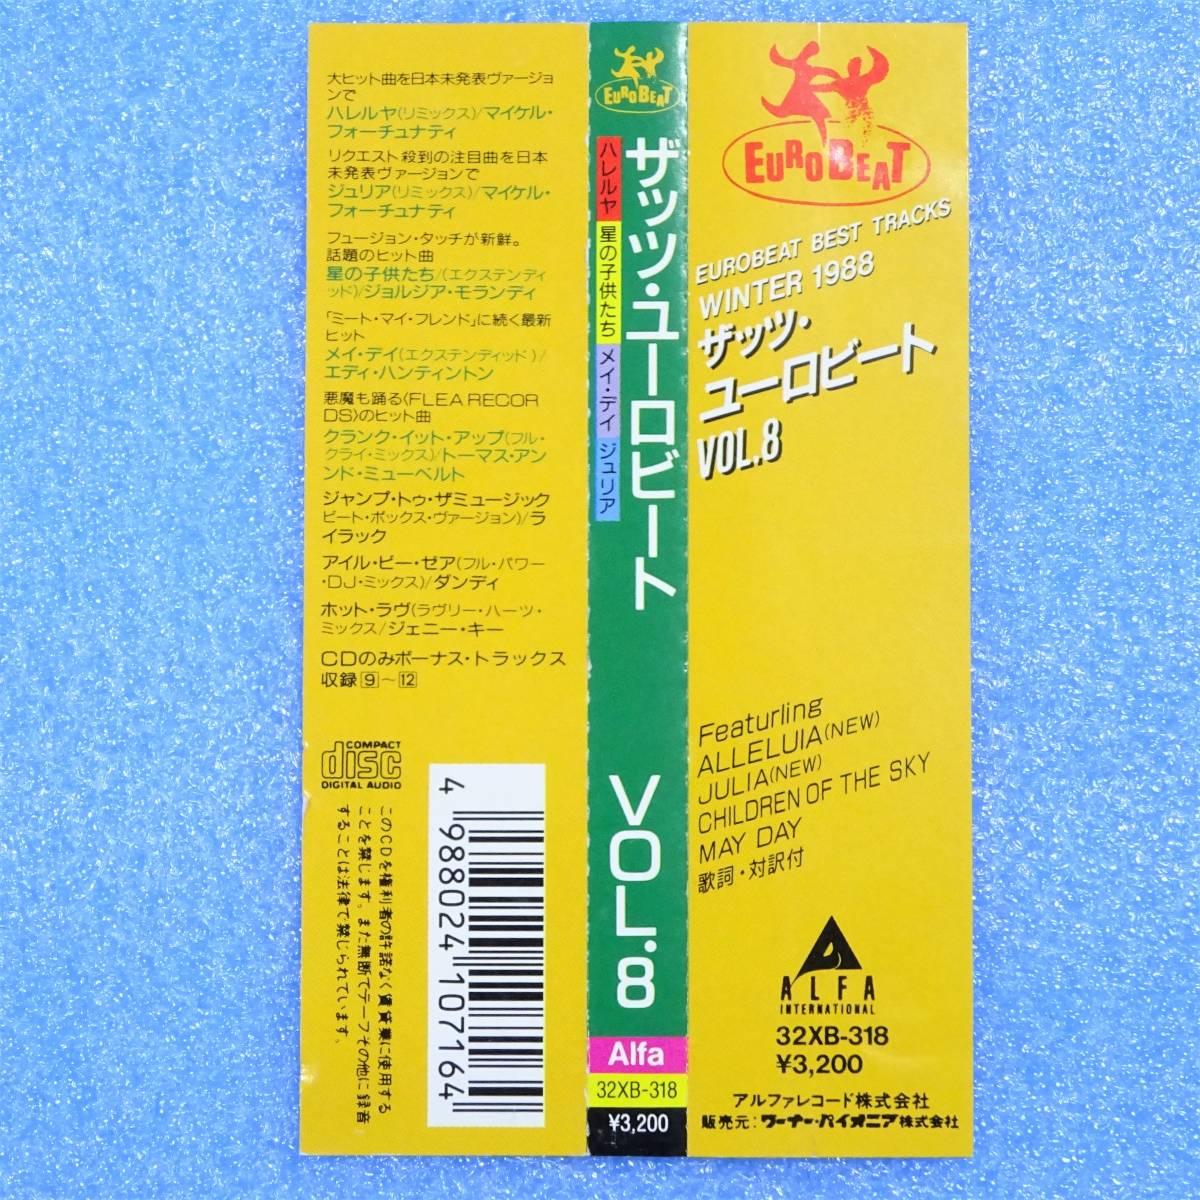 CD ザッツ・ユーロビート THAT'S EUROBEAT Vol.8 1988年 ディスコ ユーロビート マイケル・フォーチュナティ_画像4